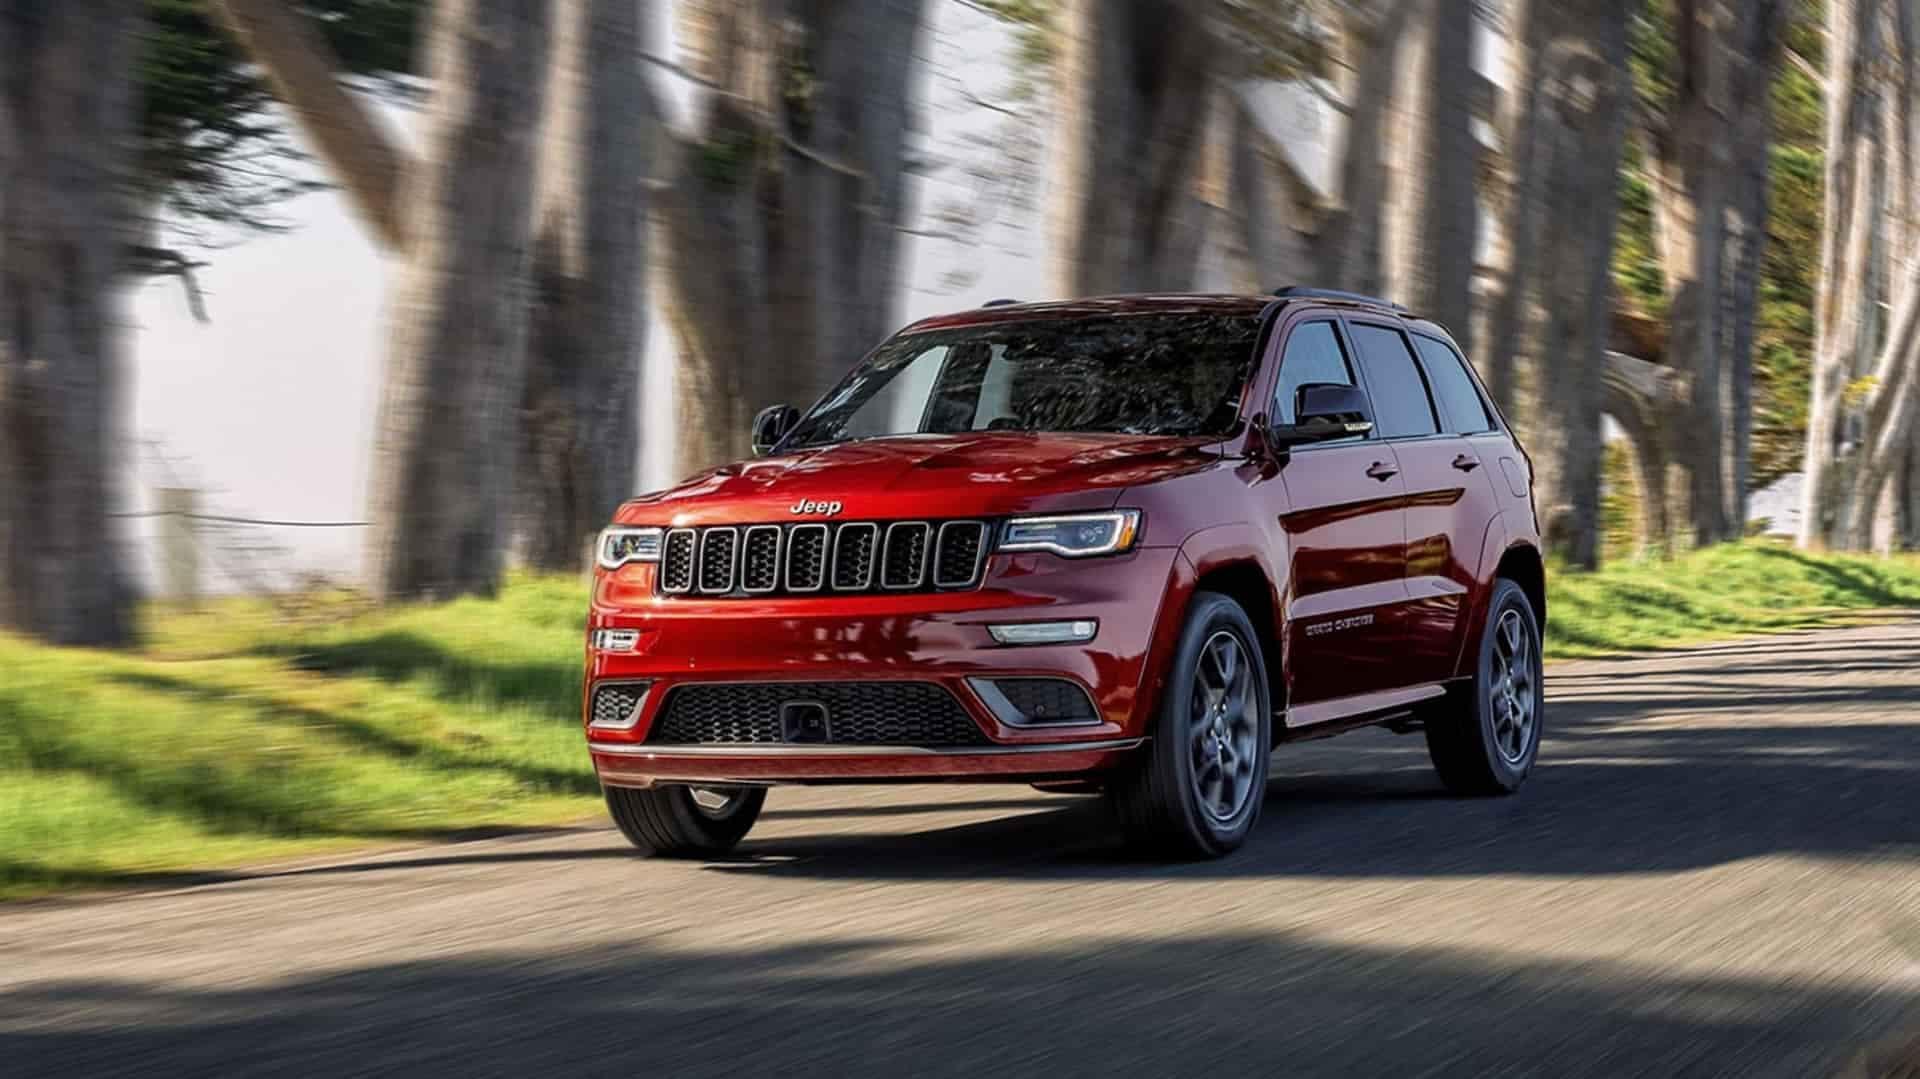 Lease the 2020 Jeep Grand Cherokee near Peru IN